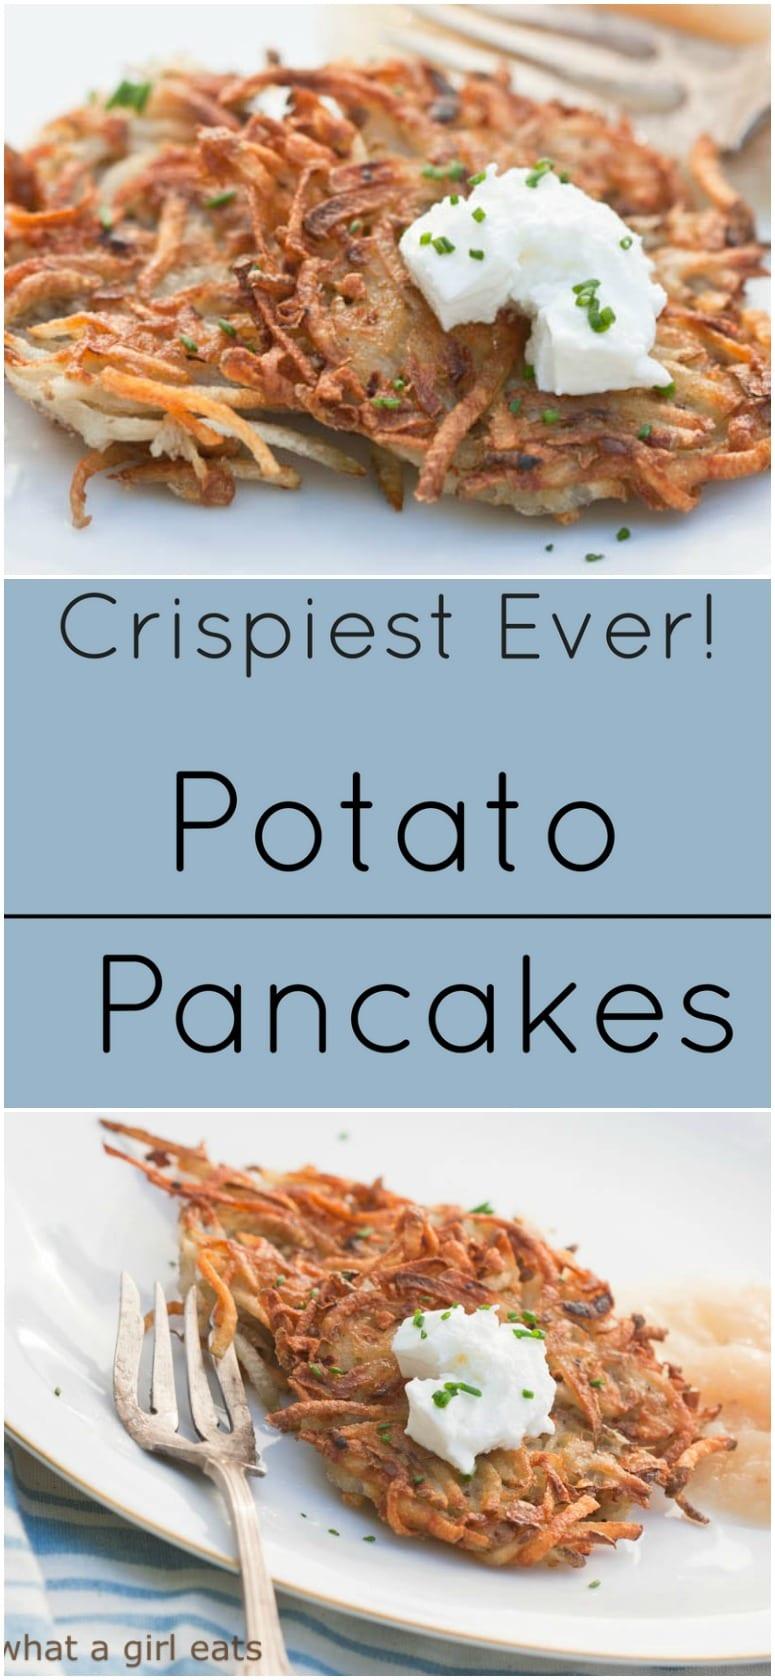 Crispiest ever potato pancakes (latkes) with sour cream and apple sauce.